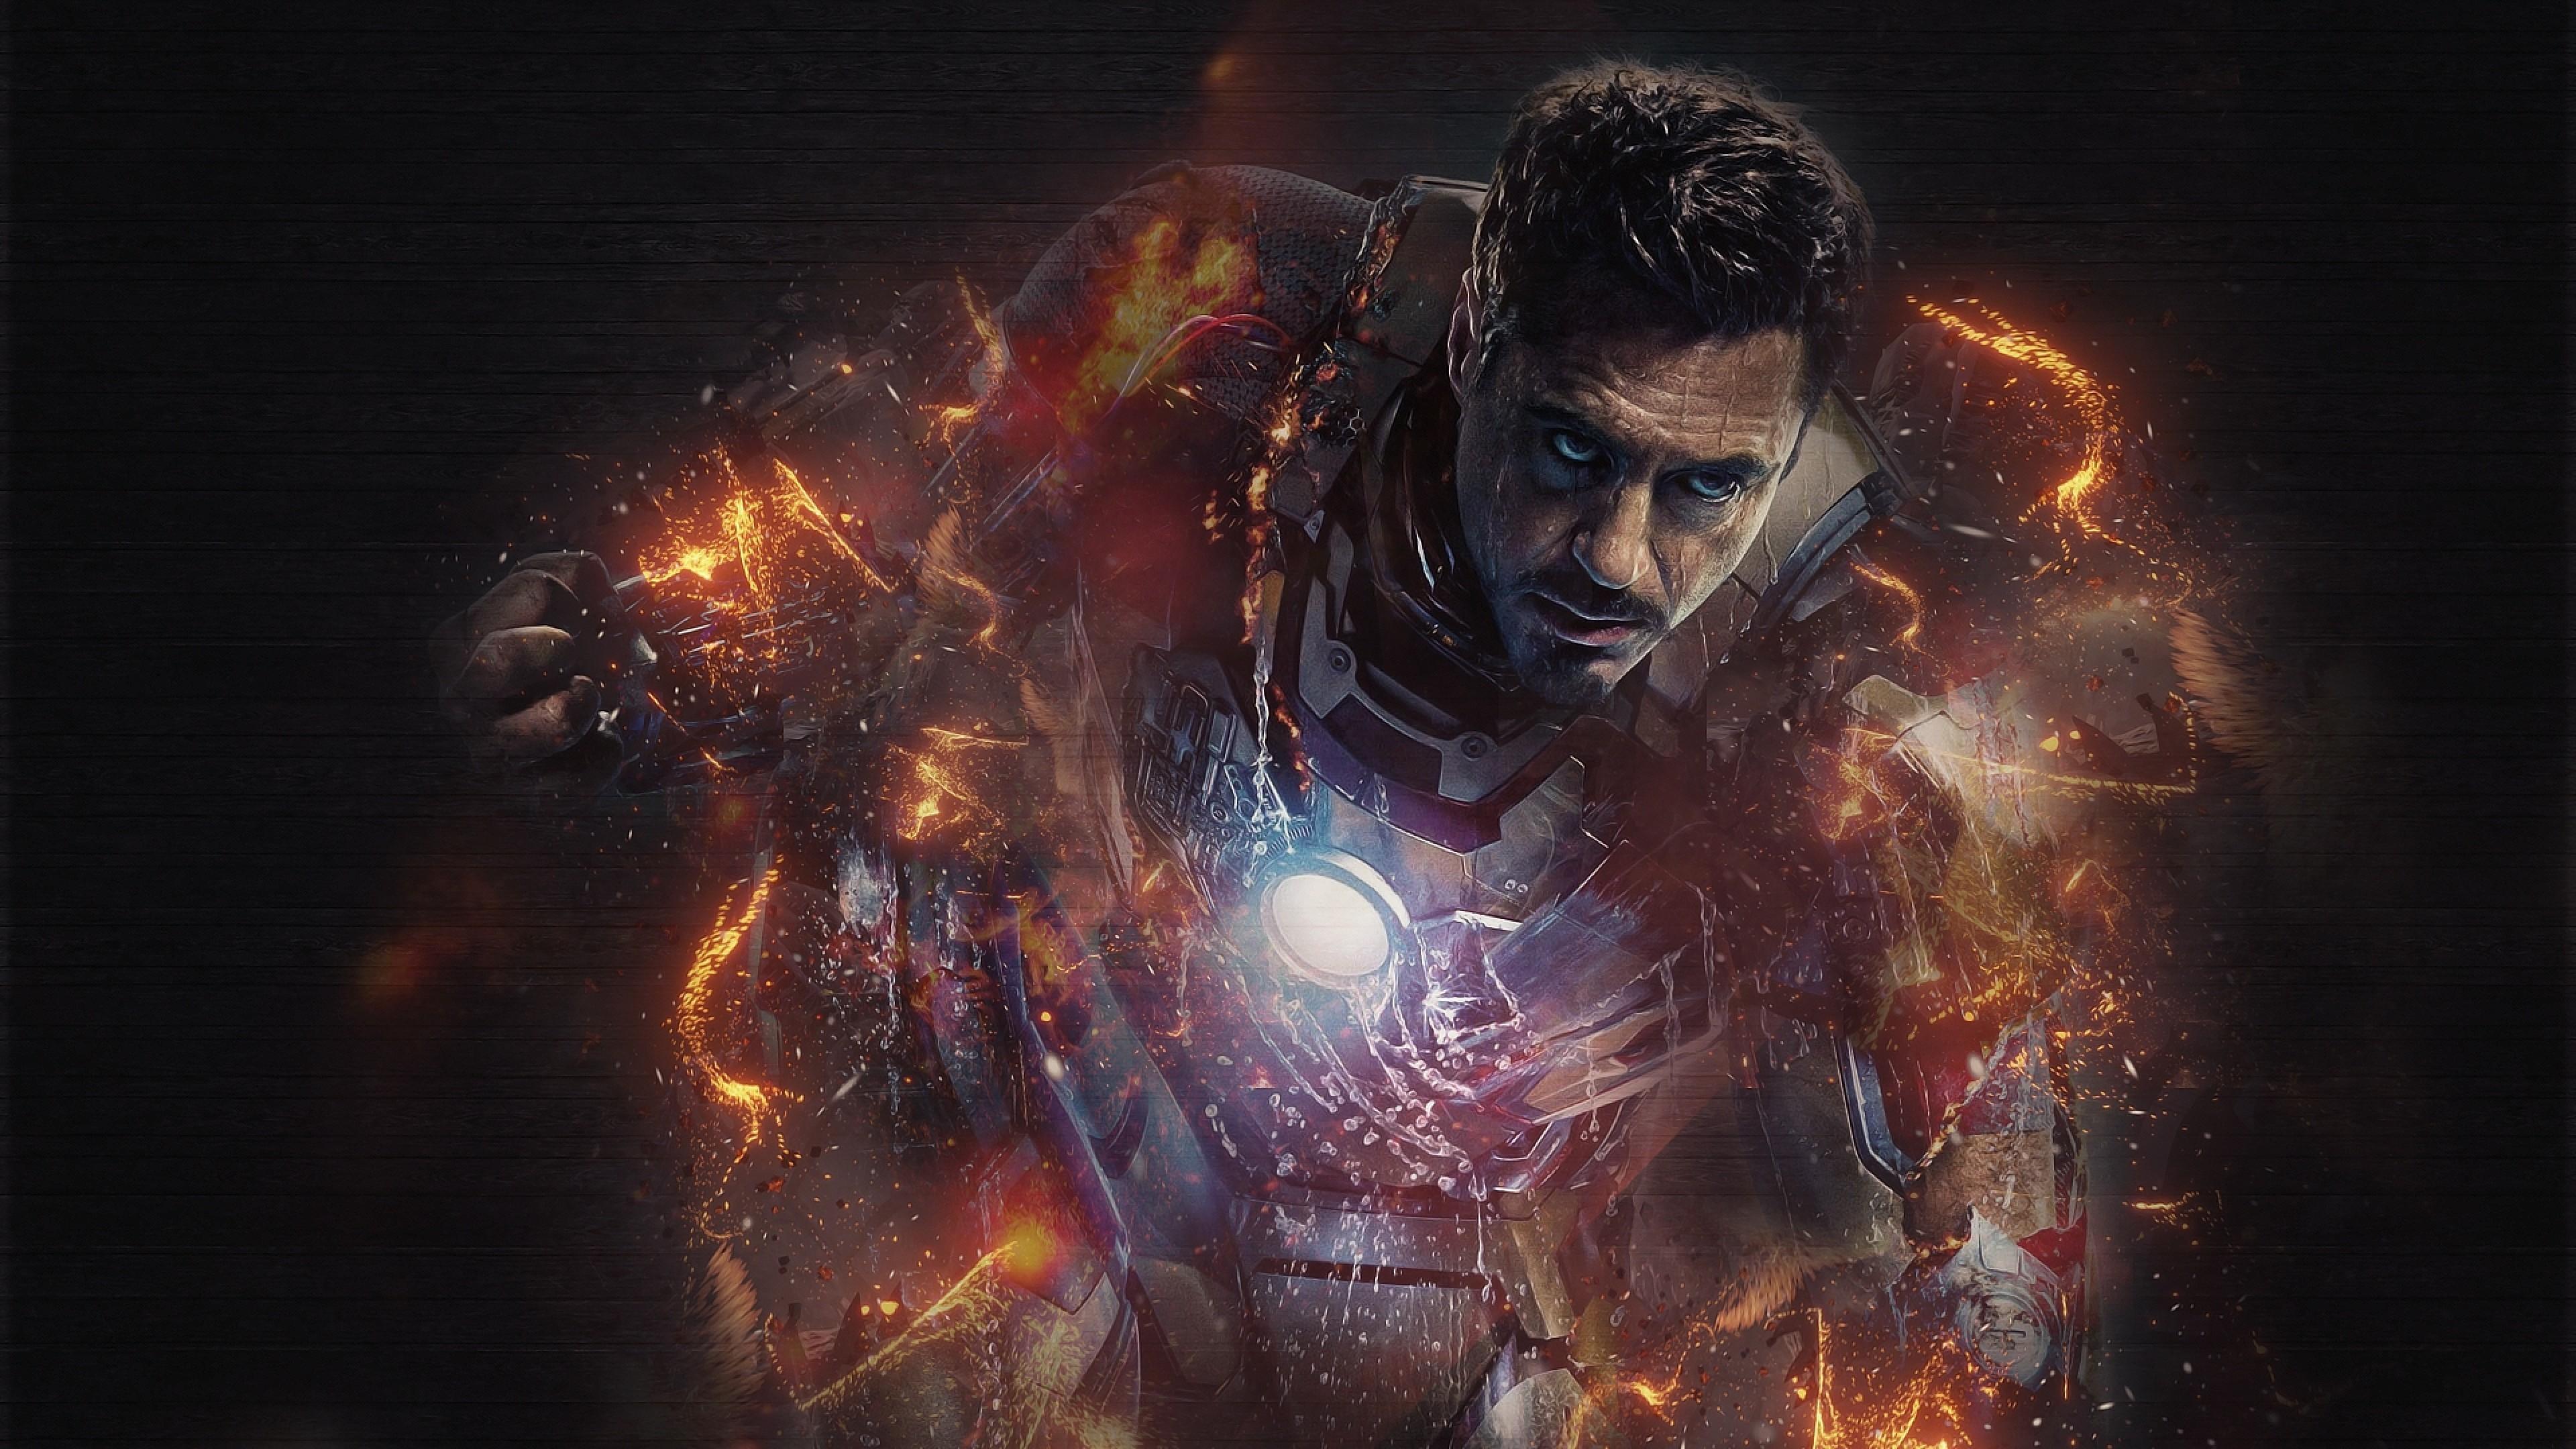 ironman 4k 2018 1537645991 - Ironman 4k 2018 - superheroes wallpapers, robert downey jr wallpapers, iron man wallpapers, hd-wallpapers, 4k-wallpapers